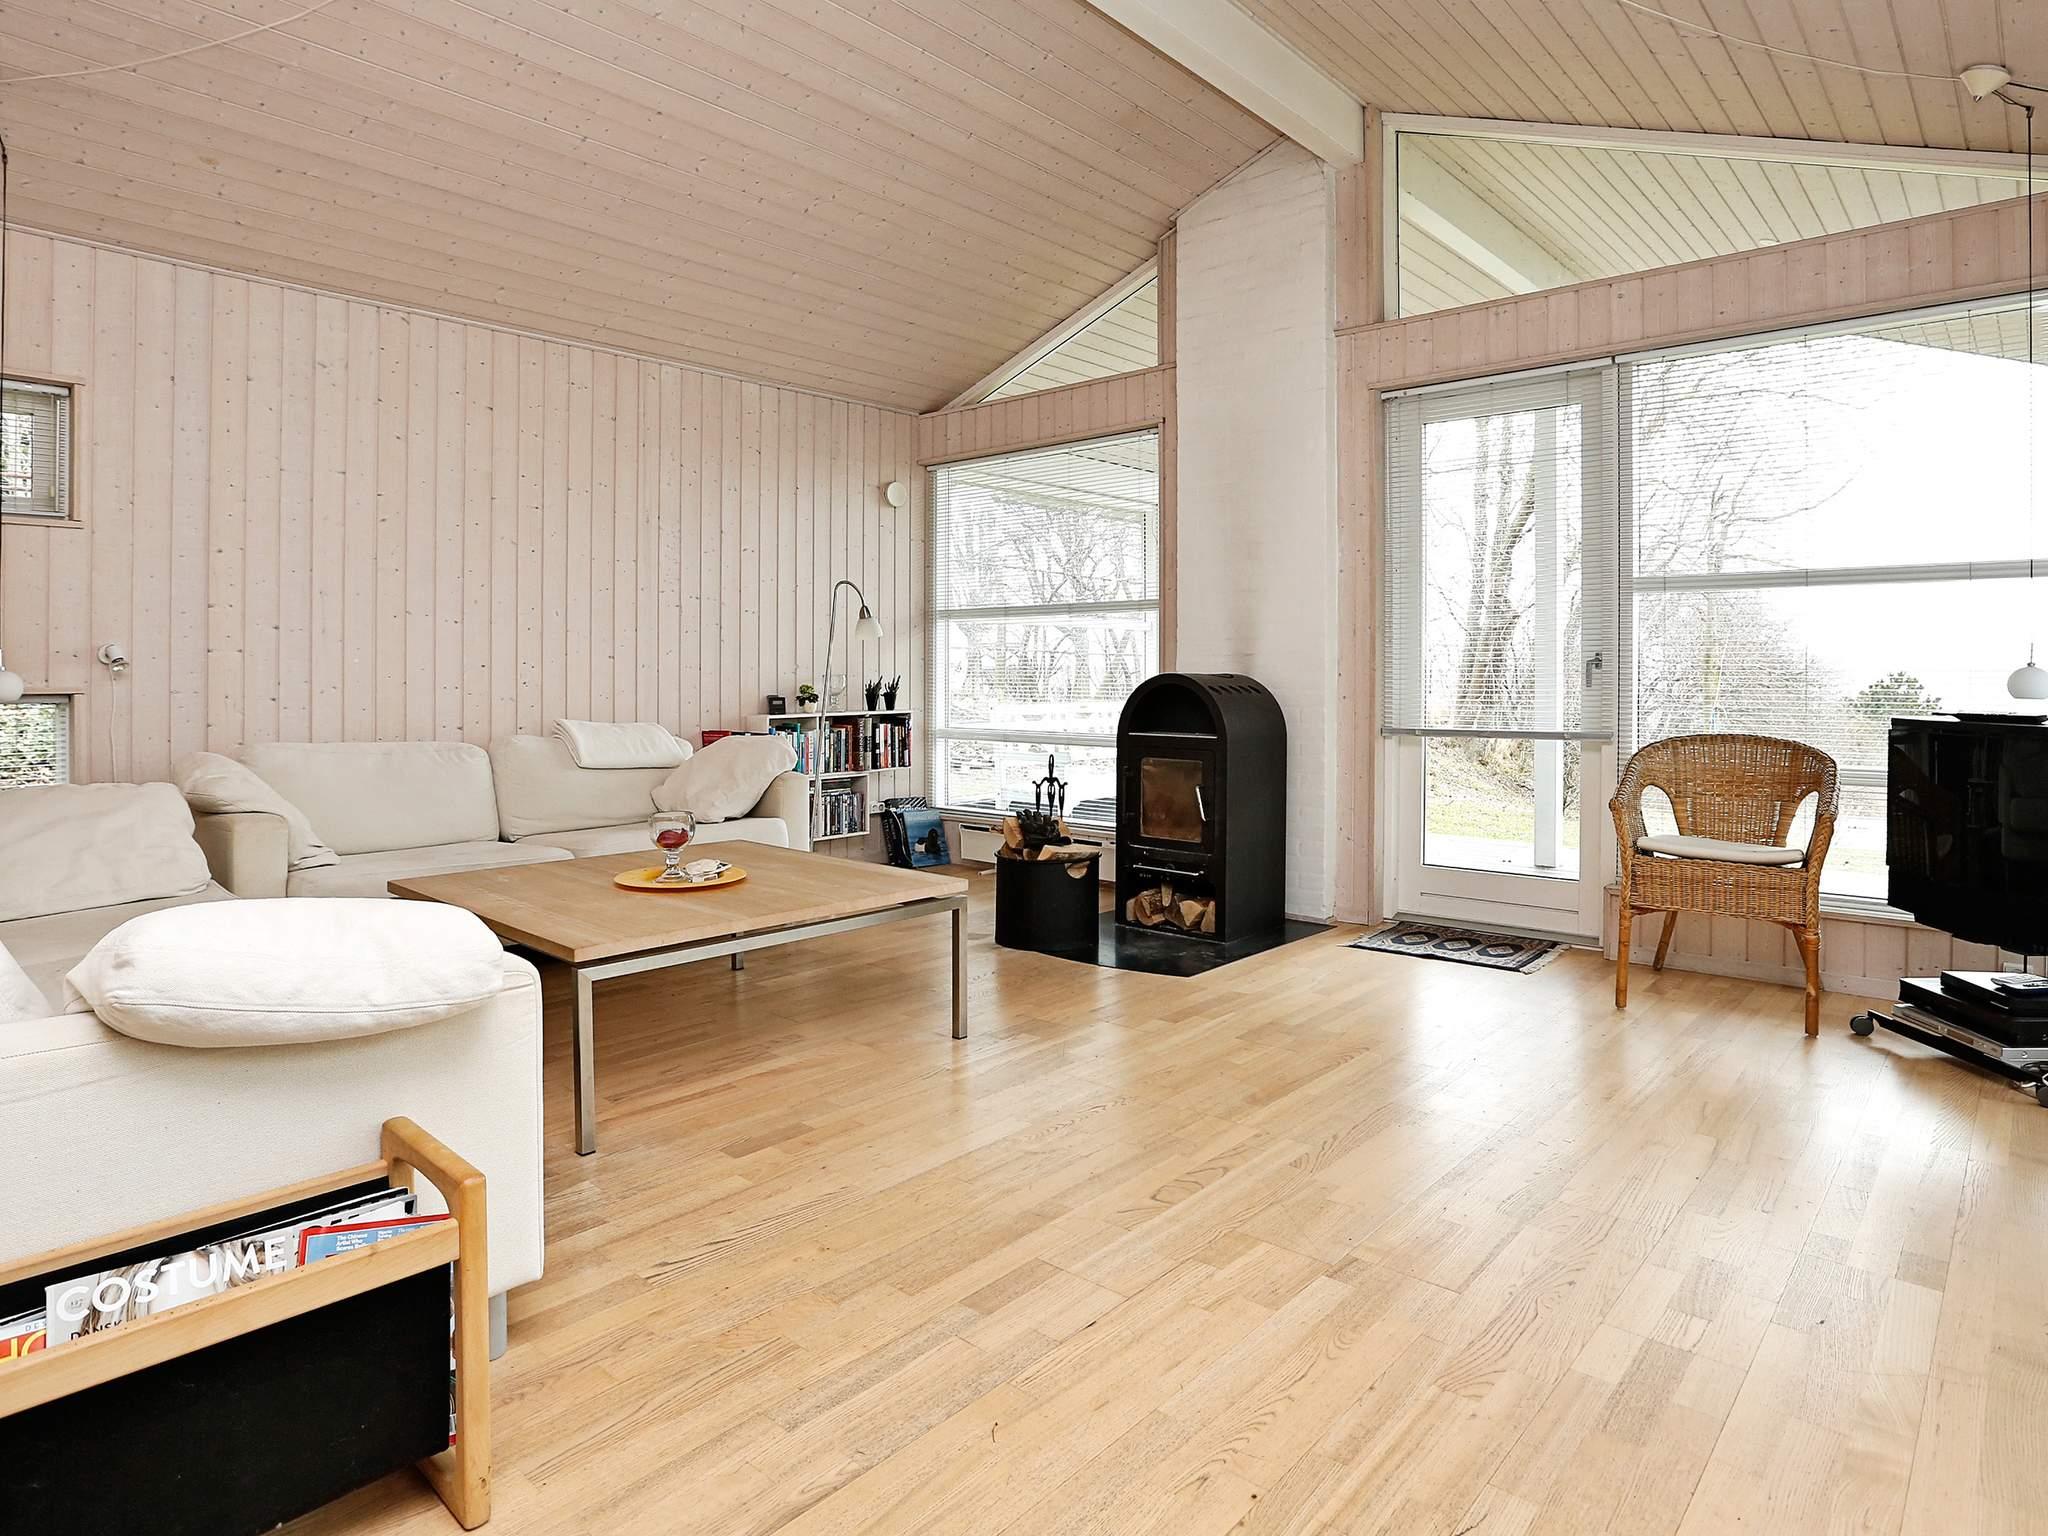 Maison de vacances Skibby (124927), Kirke Hyllinge, , Seeland Nord, Danemark, image 2